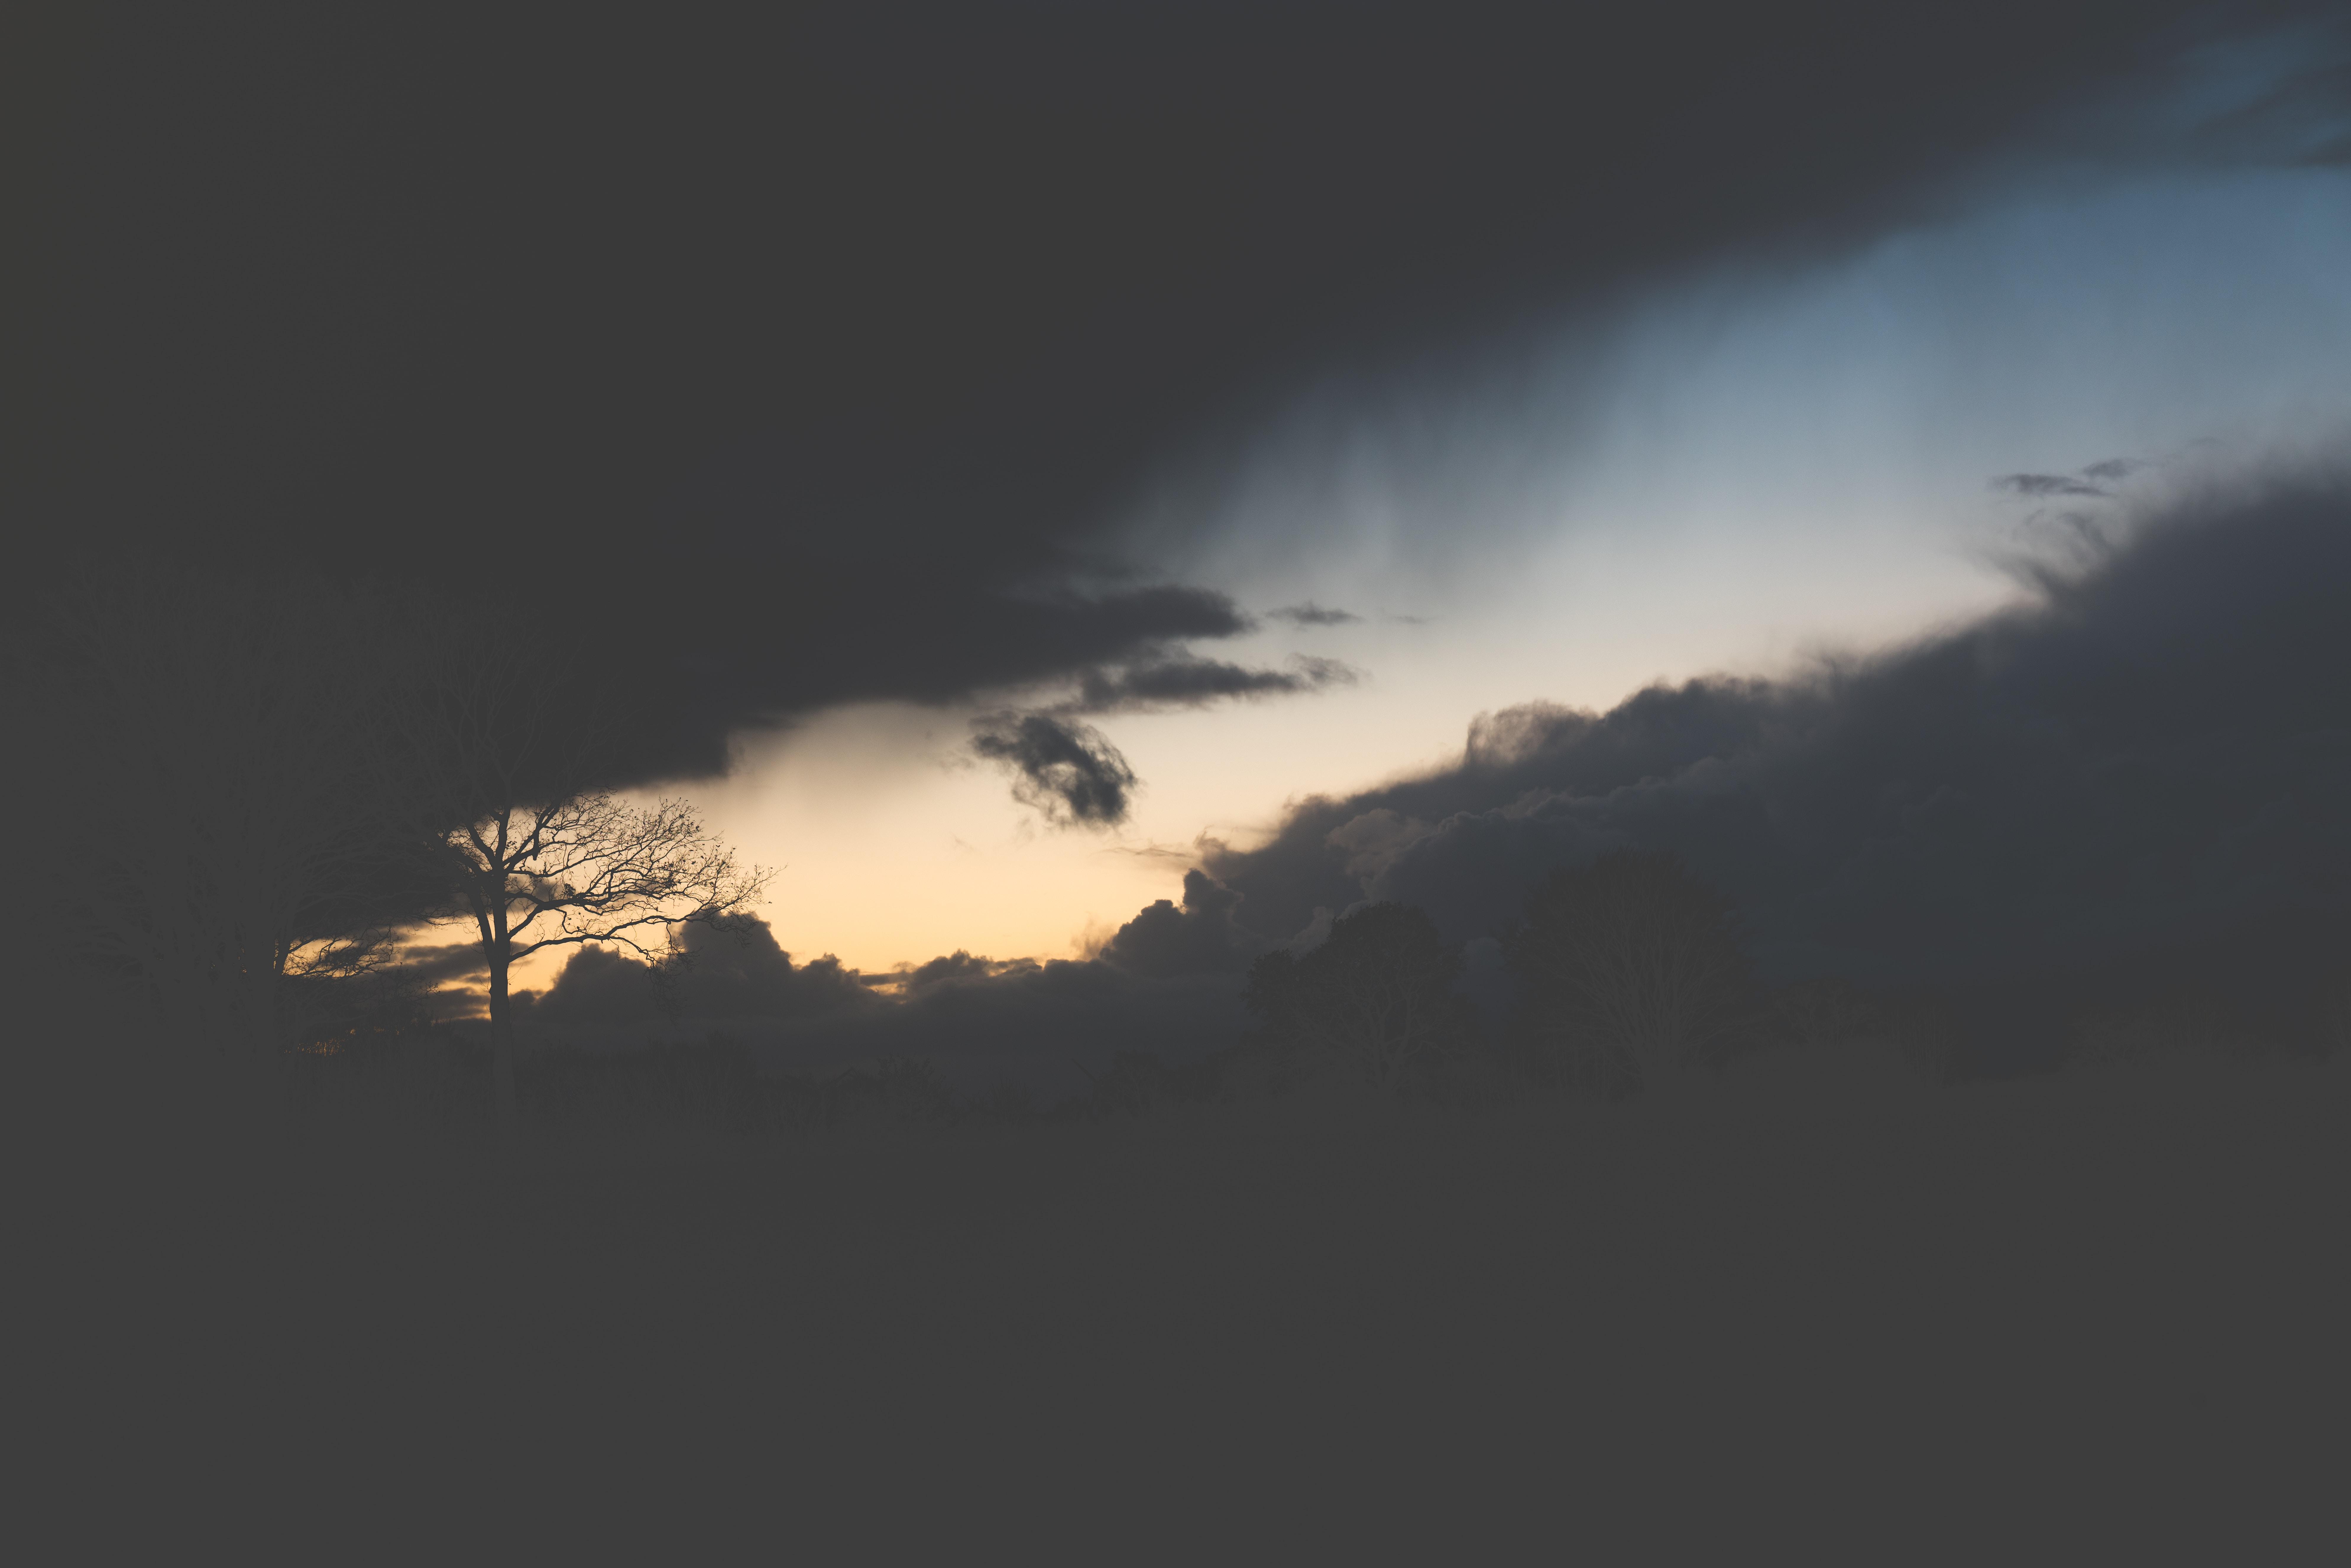 sunset scenery